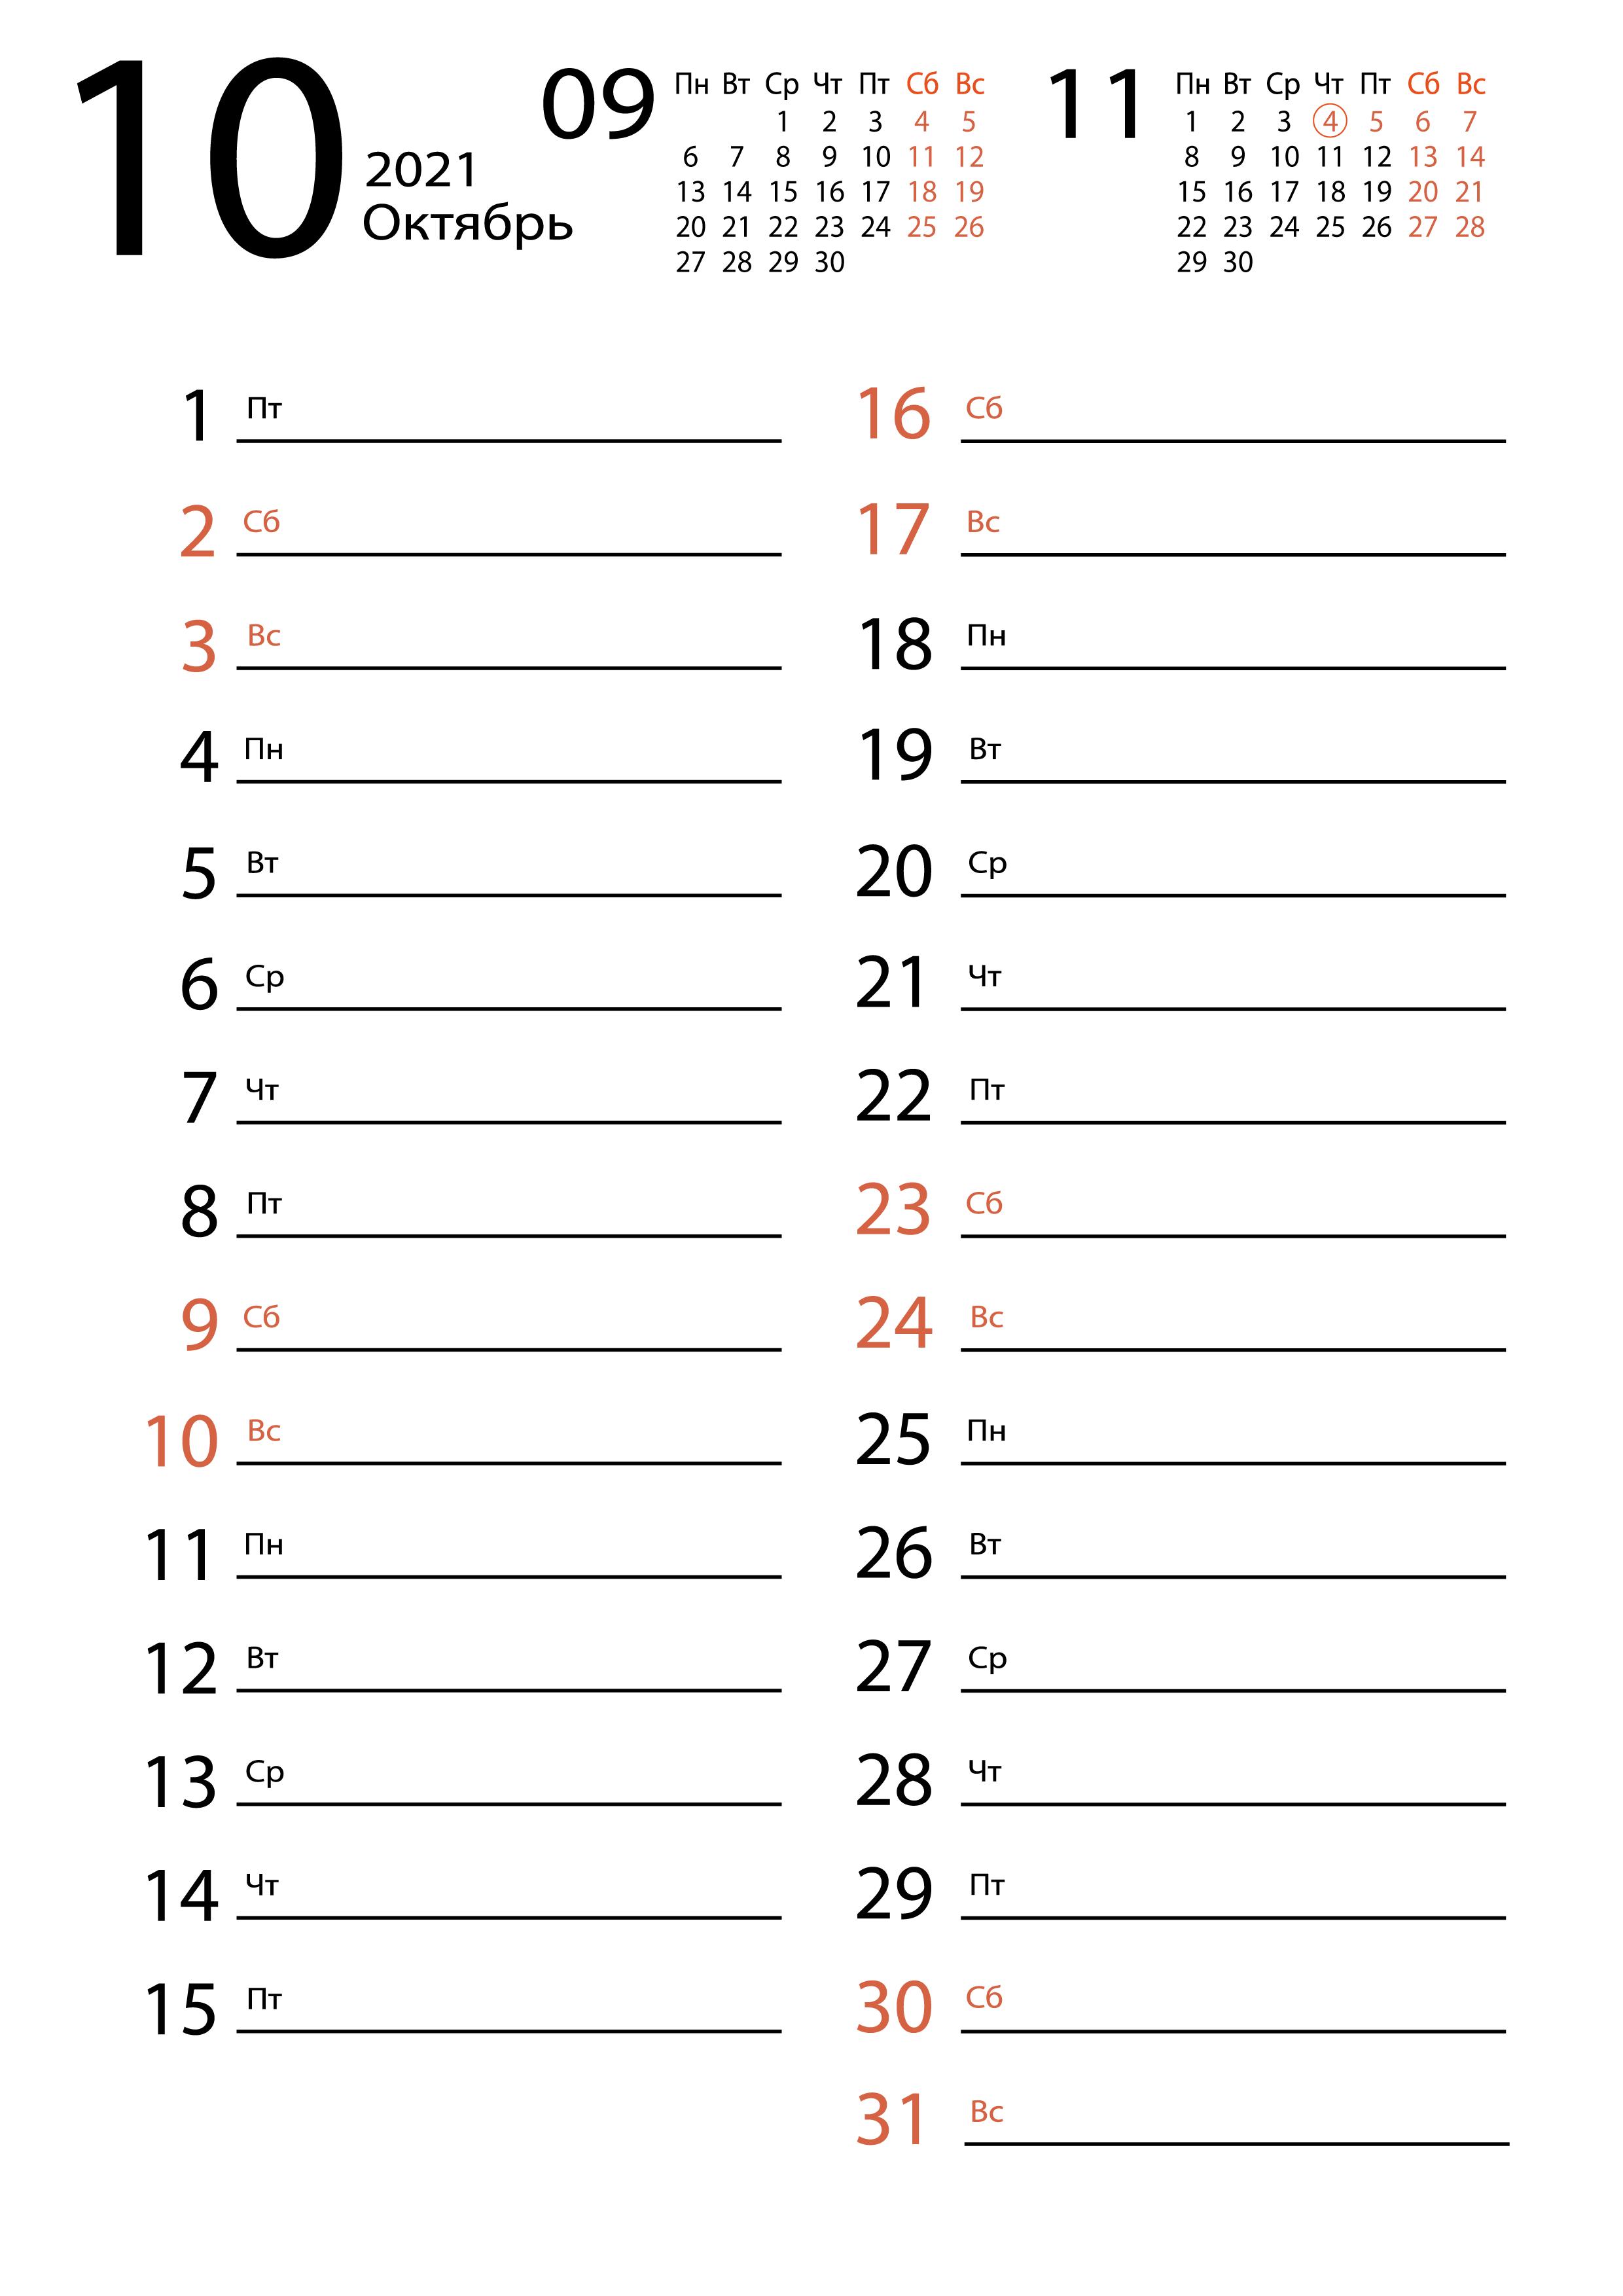 Календарь для заметок на Октябрь 2021 года